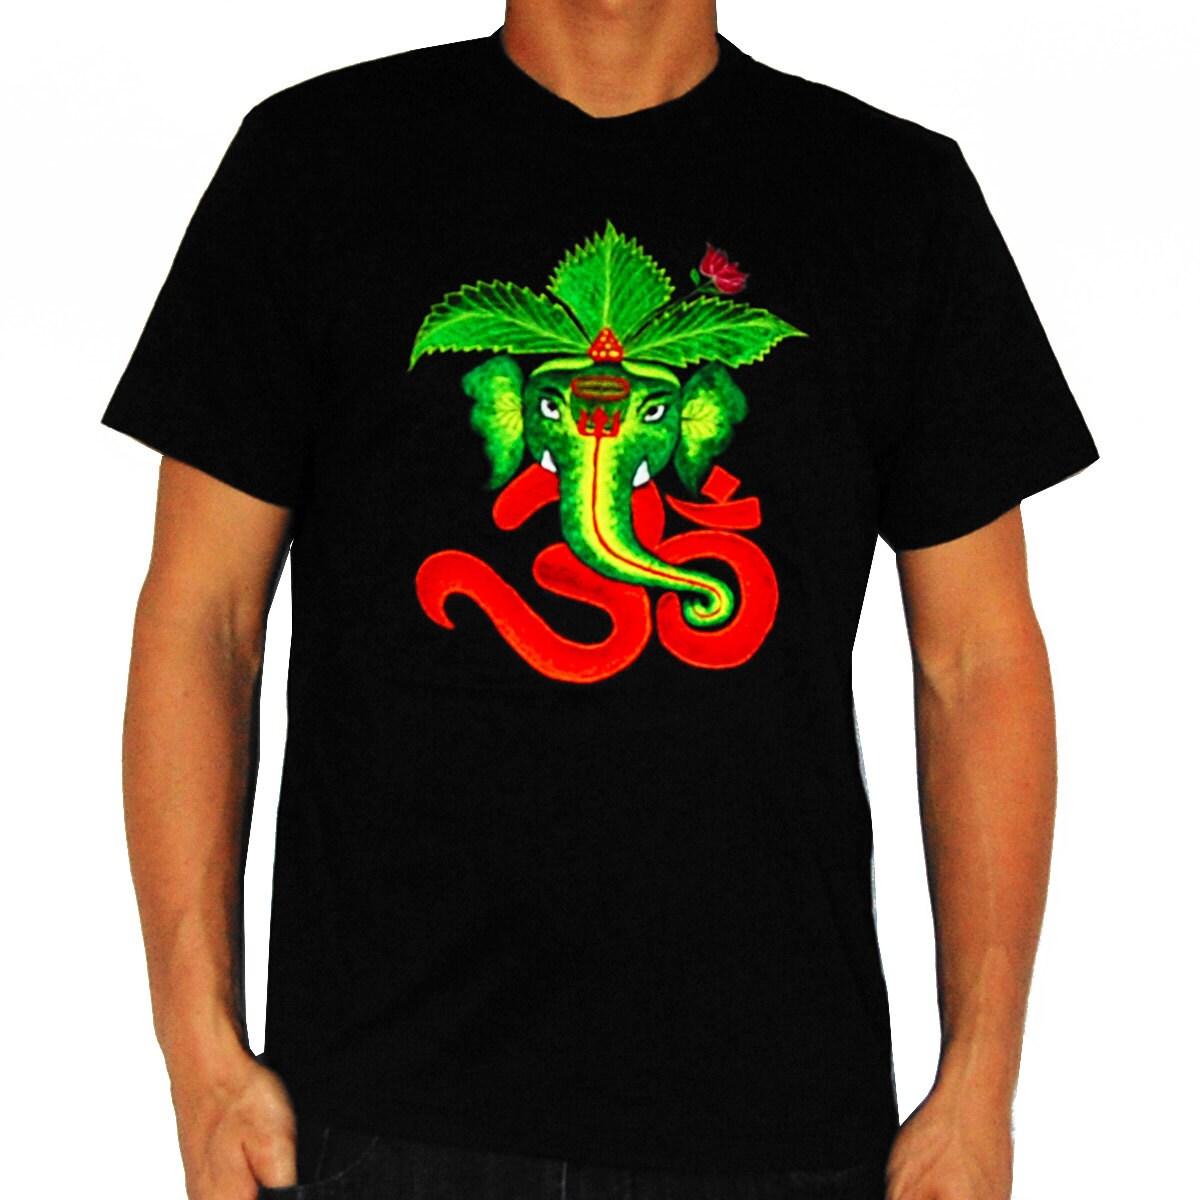 AUM Ganesha T-Shirt Blacklight Handmade Embroidery No